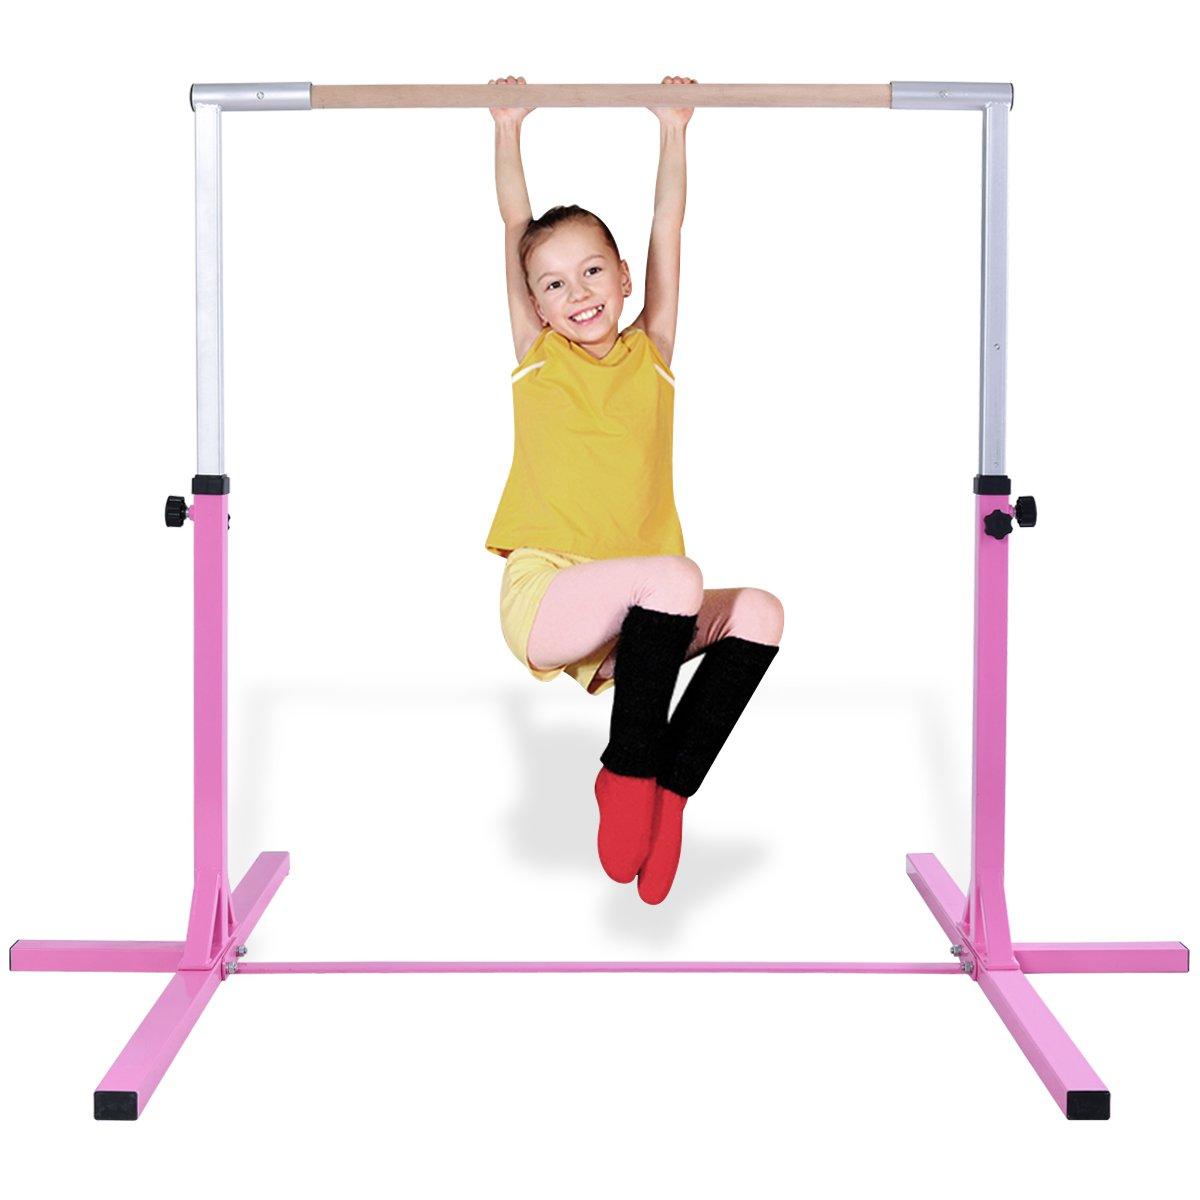 Costzon Junior Training Bar, Gymnastics Adjustable Steel Gymnastic Horizontal Bar,Pink